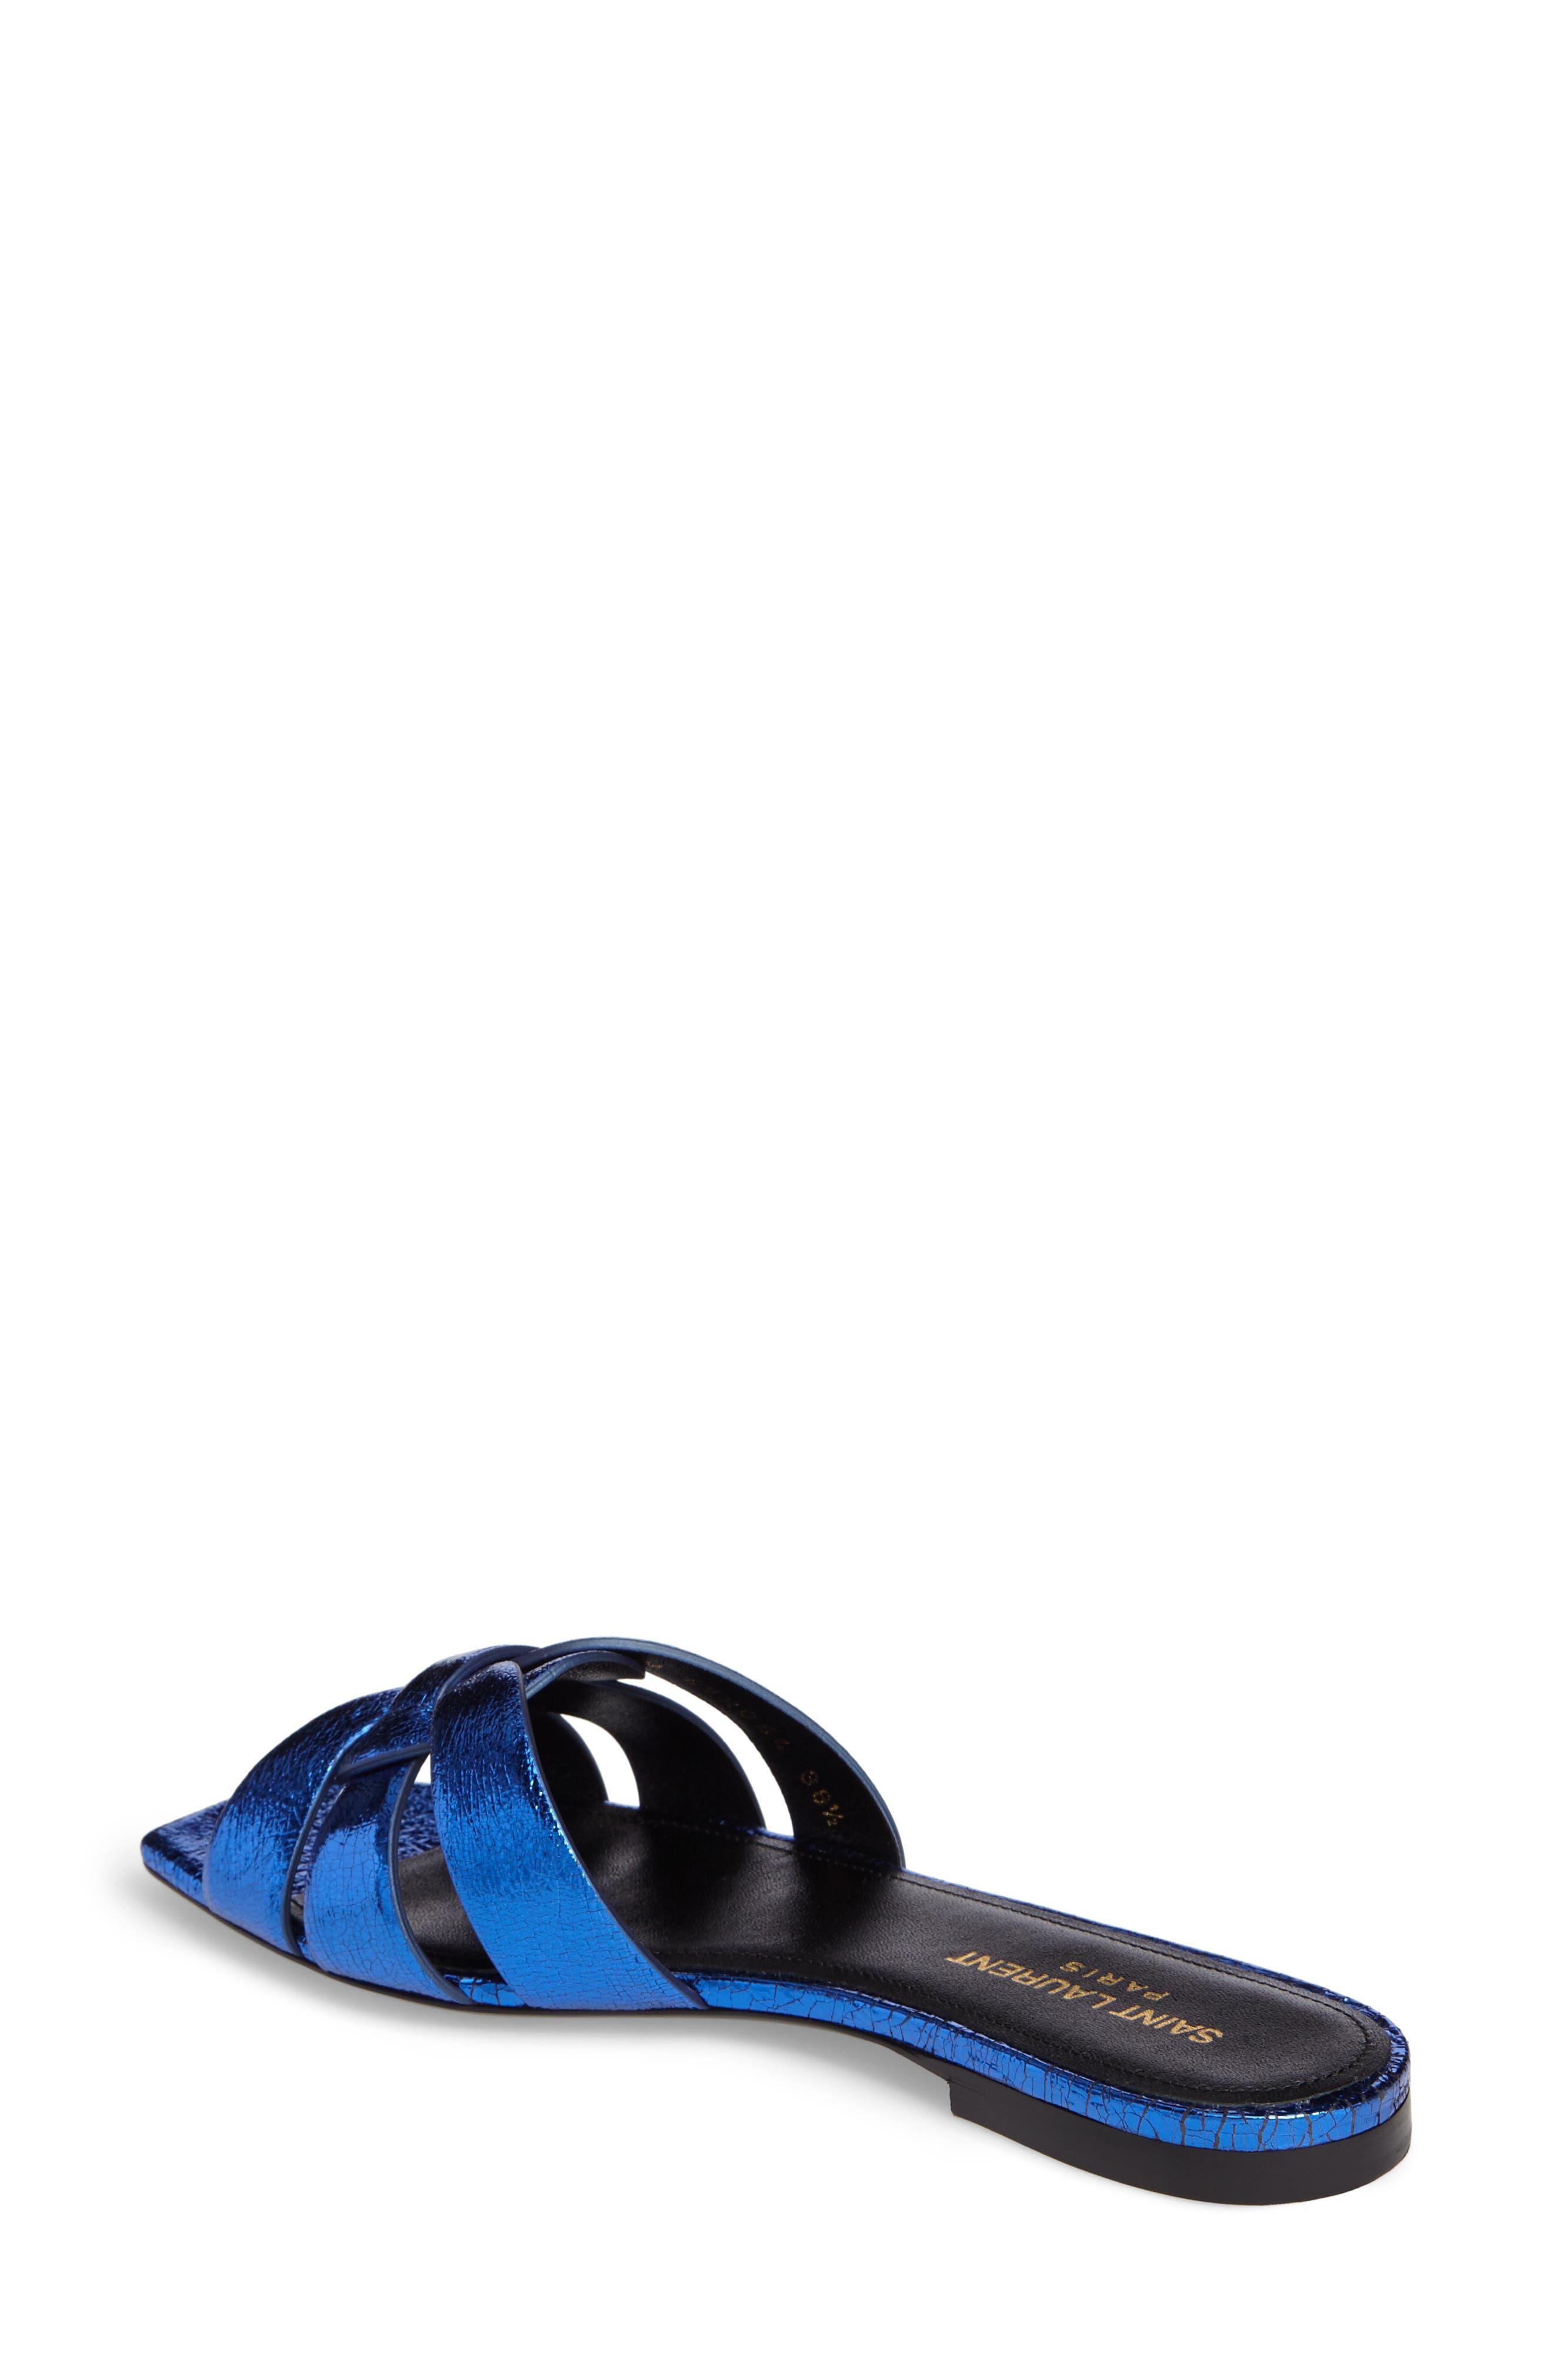 Pieds Metallic Slide Sandal,                             Alternate thumbnail 2, color,                             Blue Metal